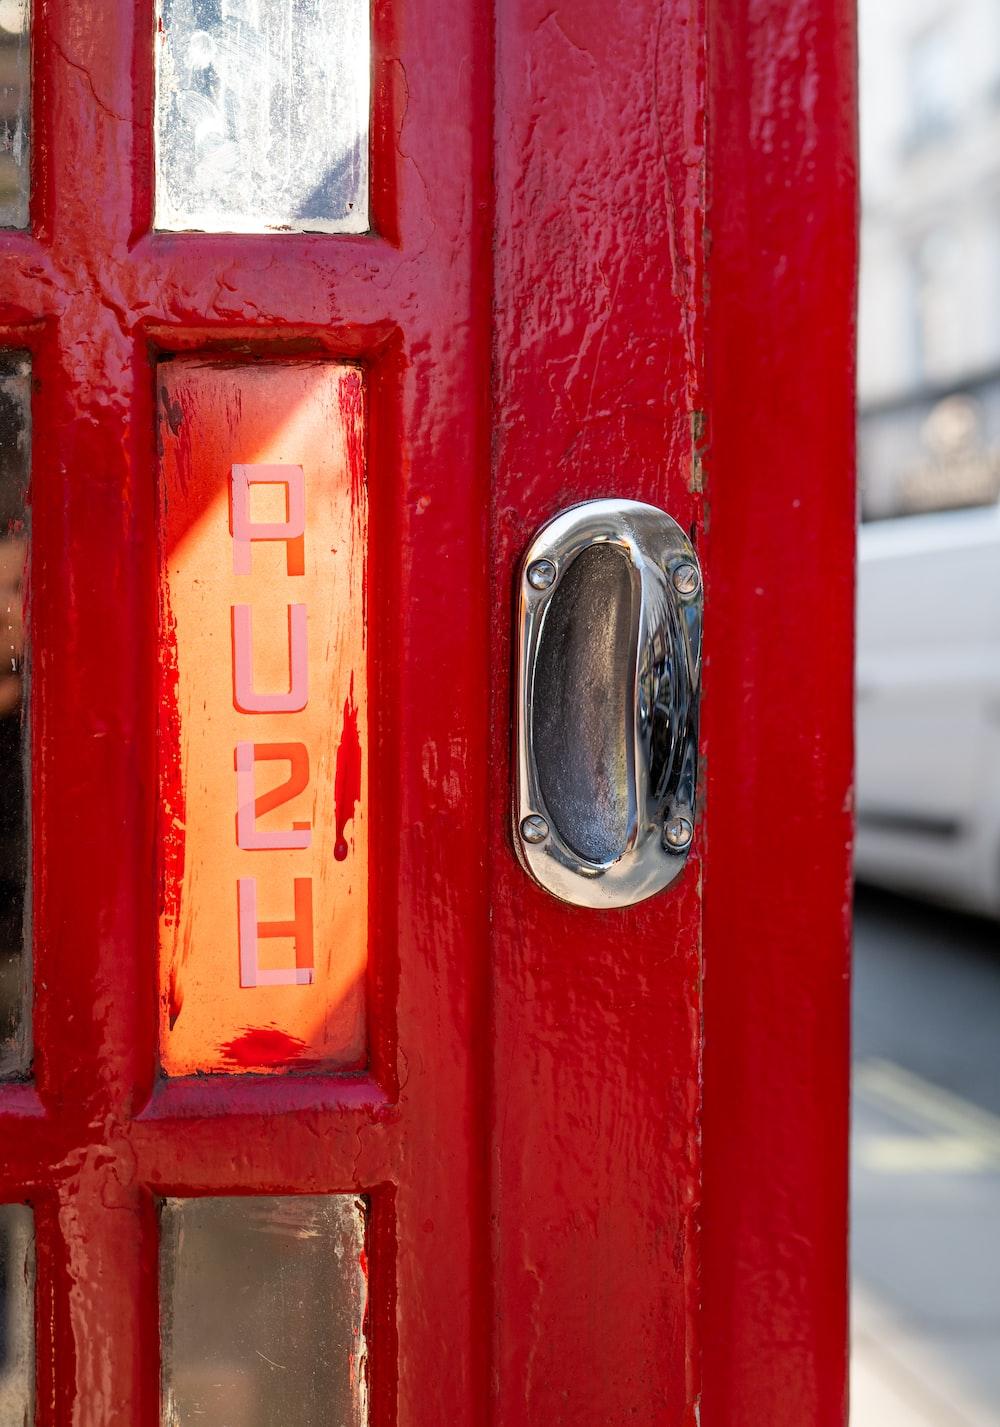 red and silver love print door handle